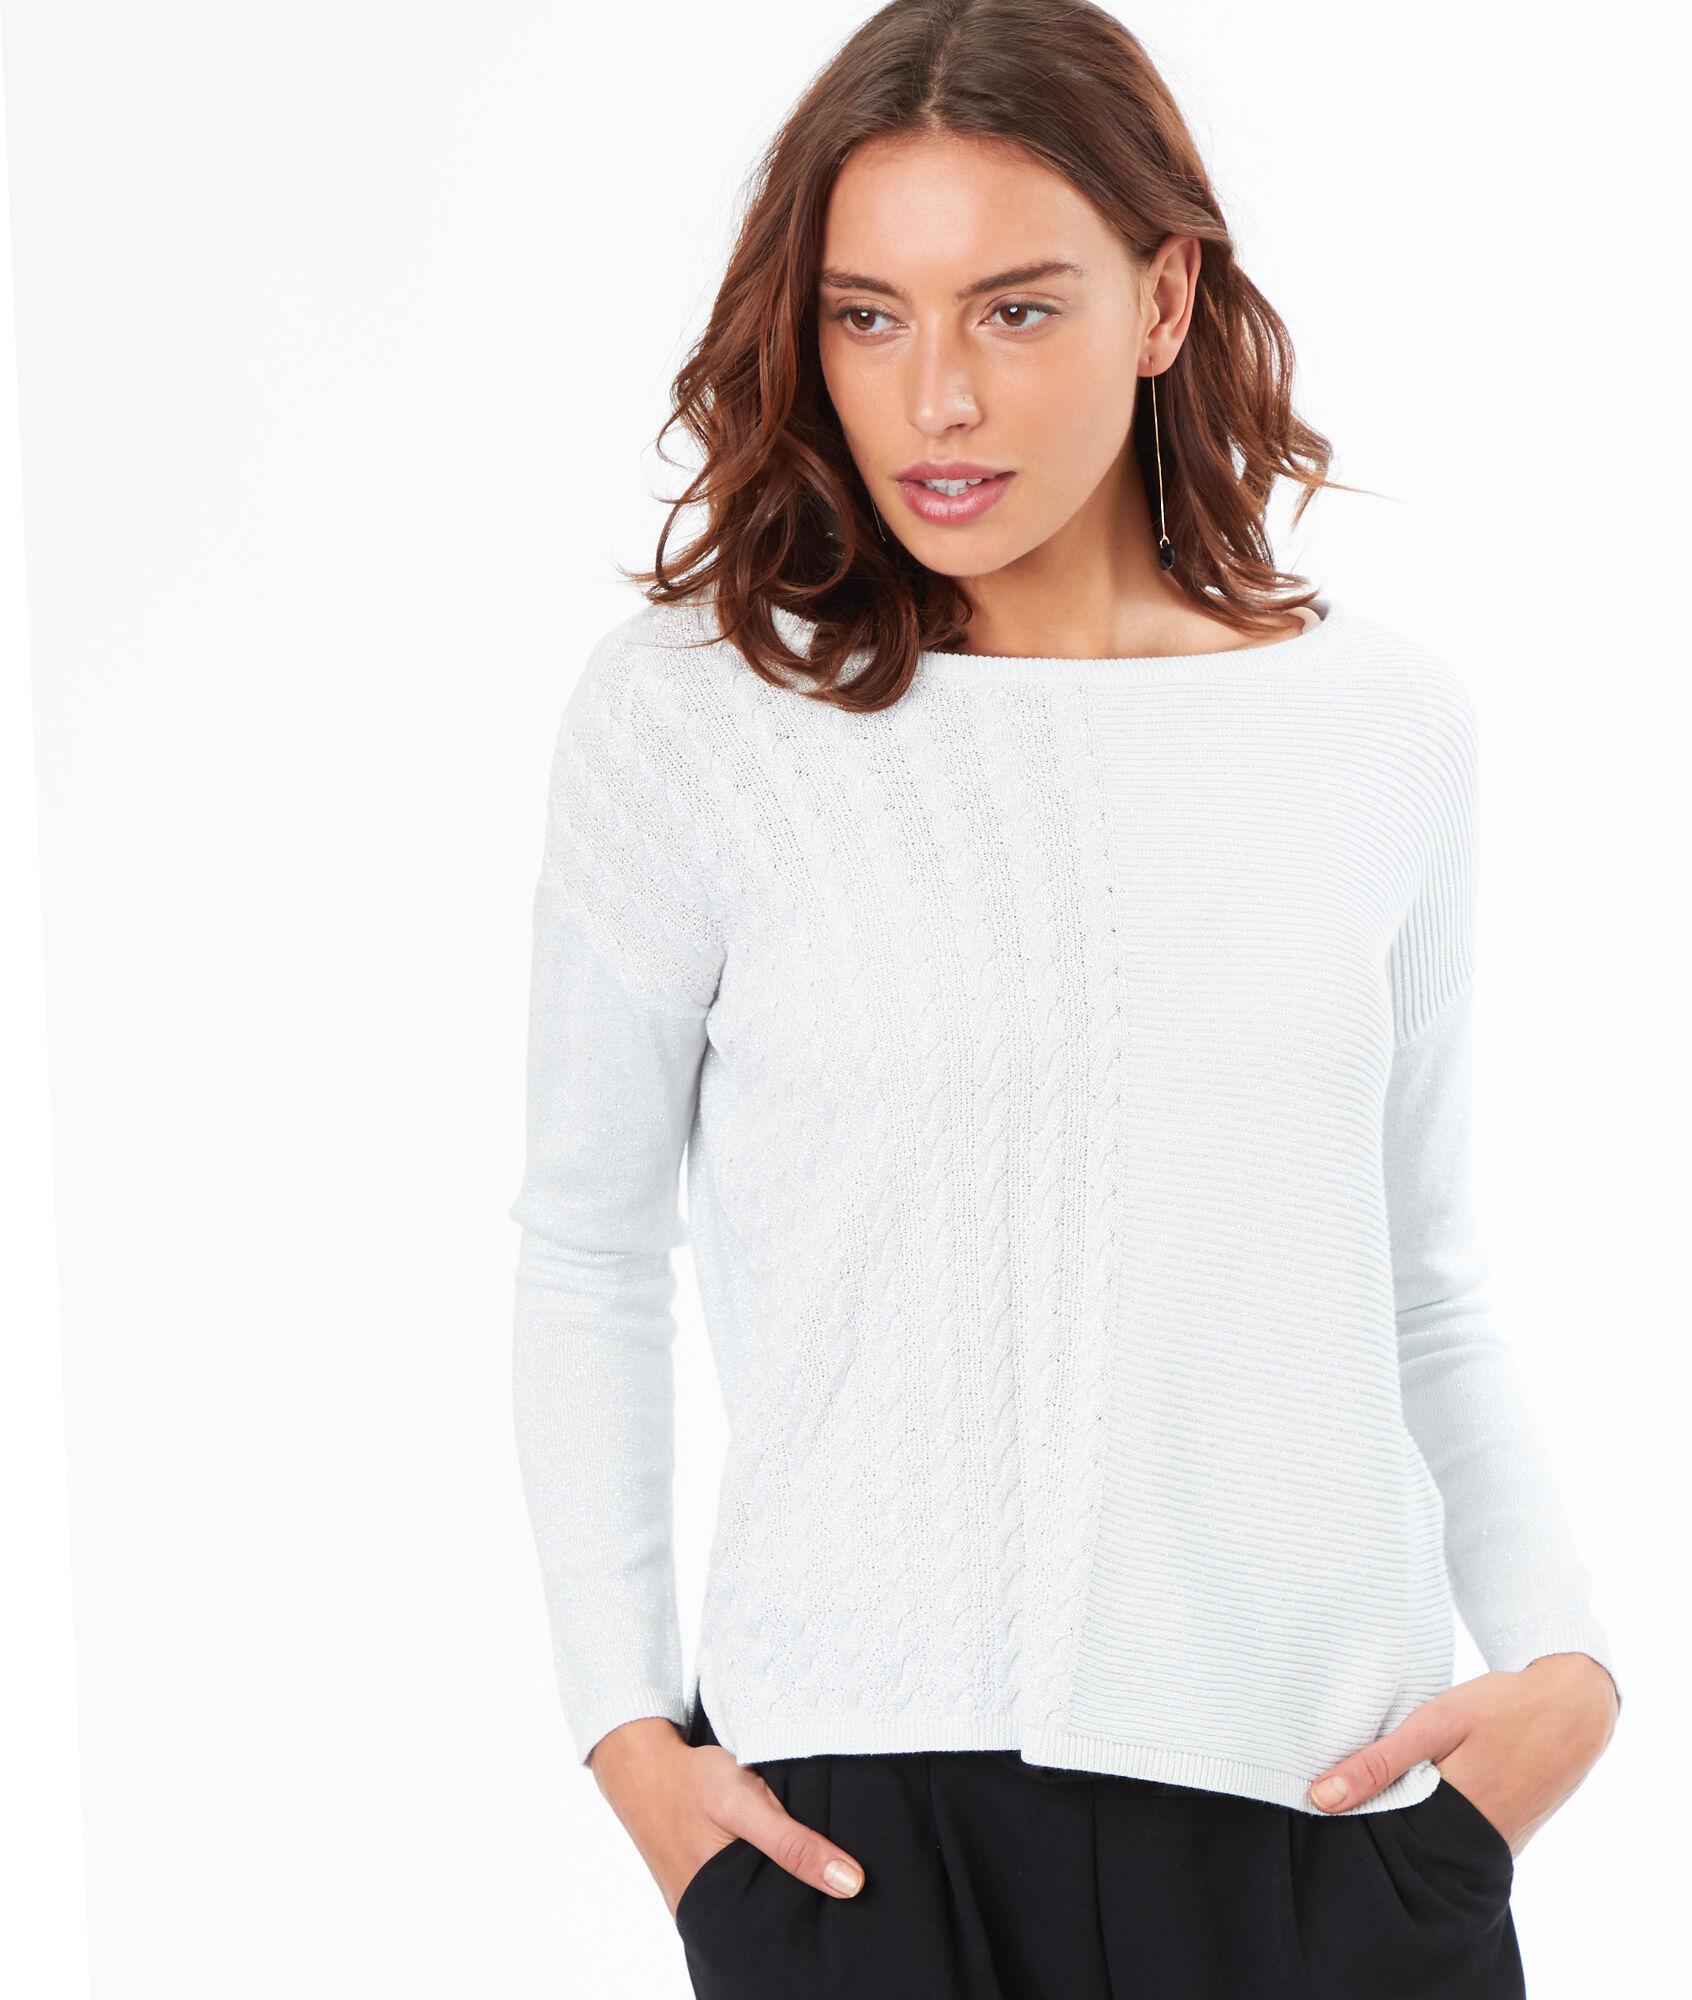 Robe pull blanche etam